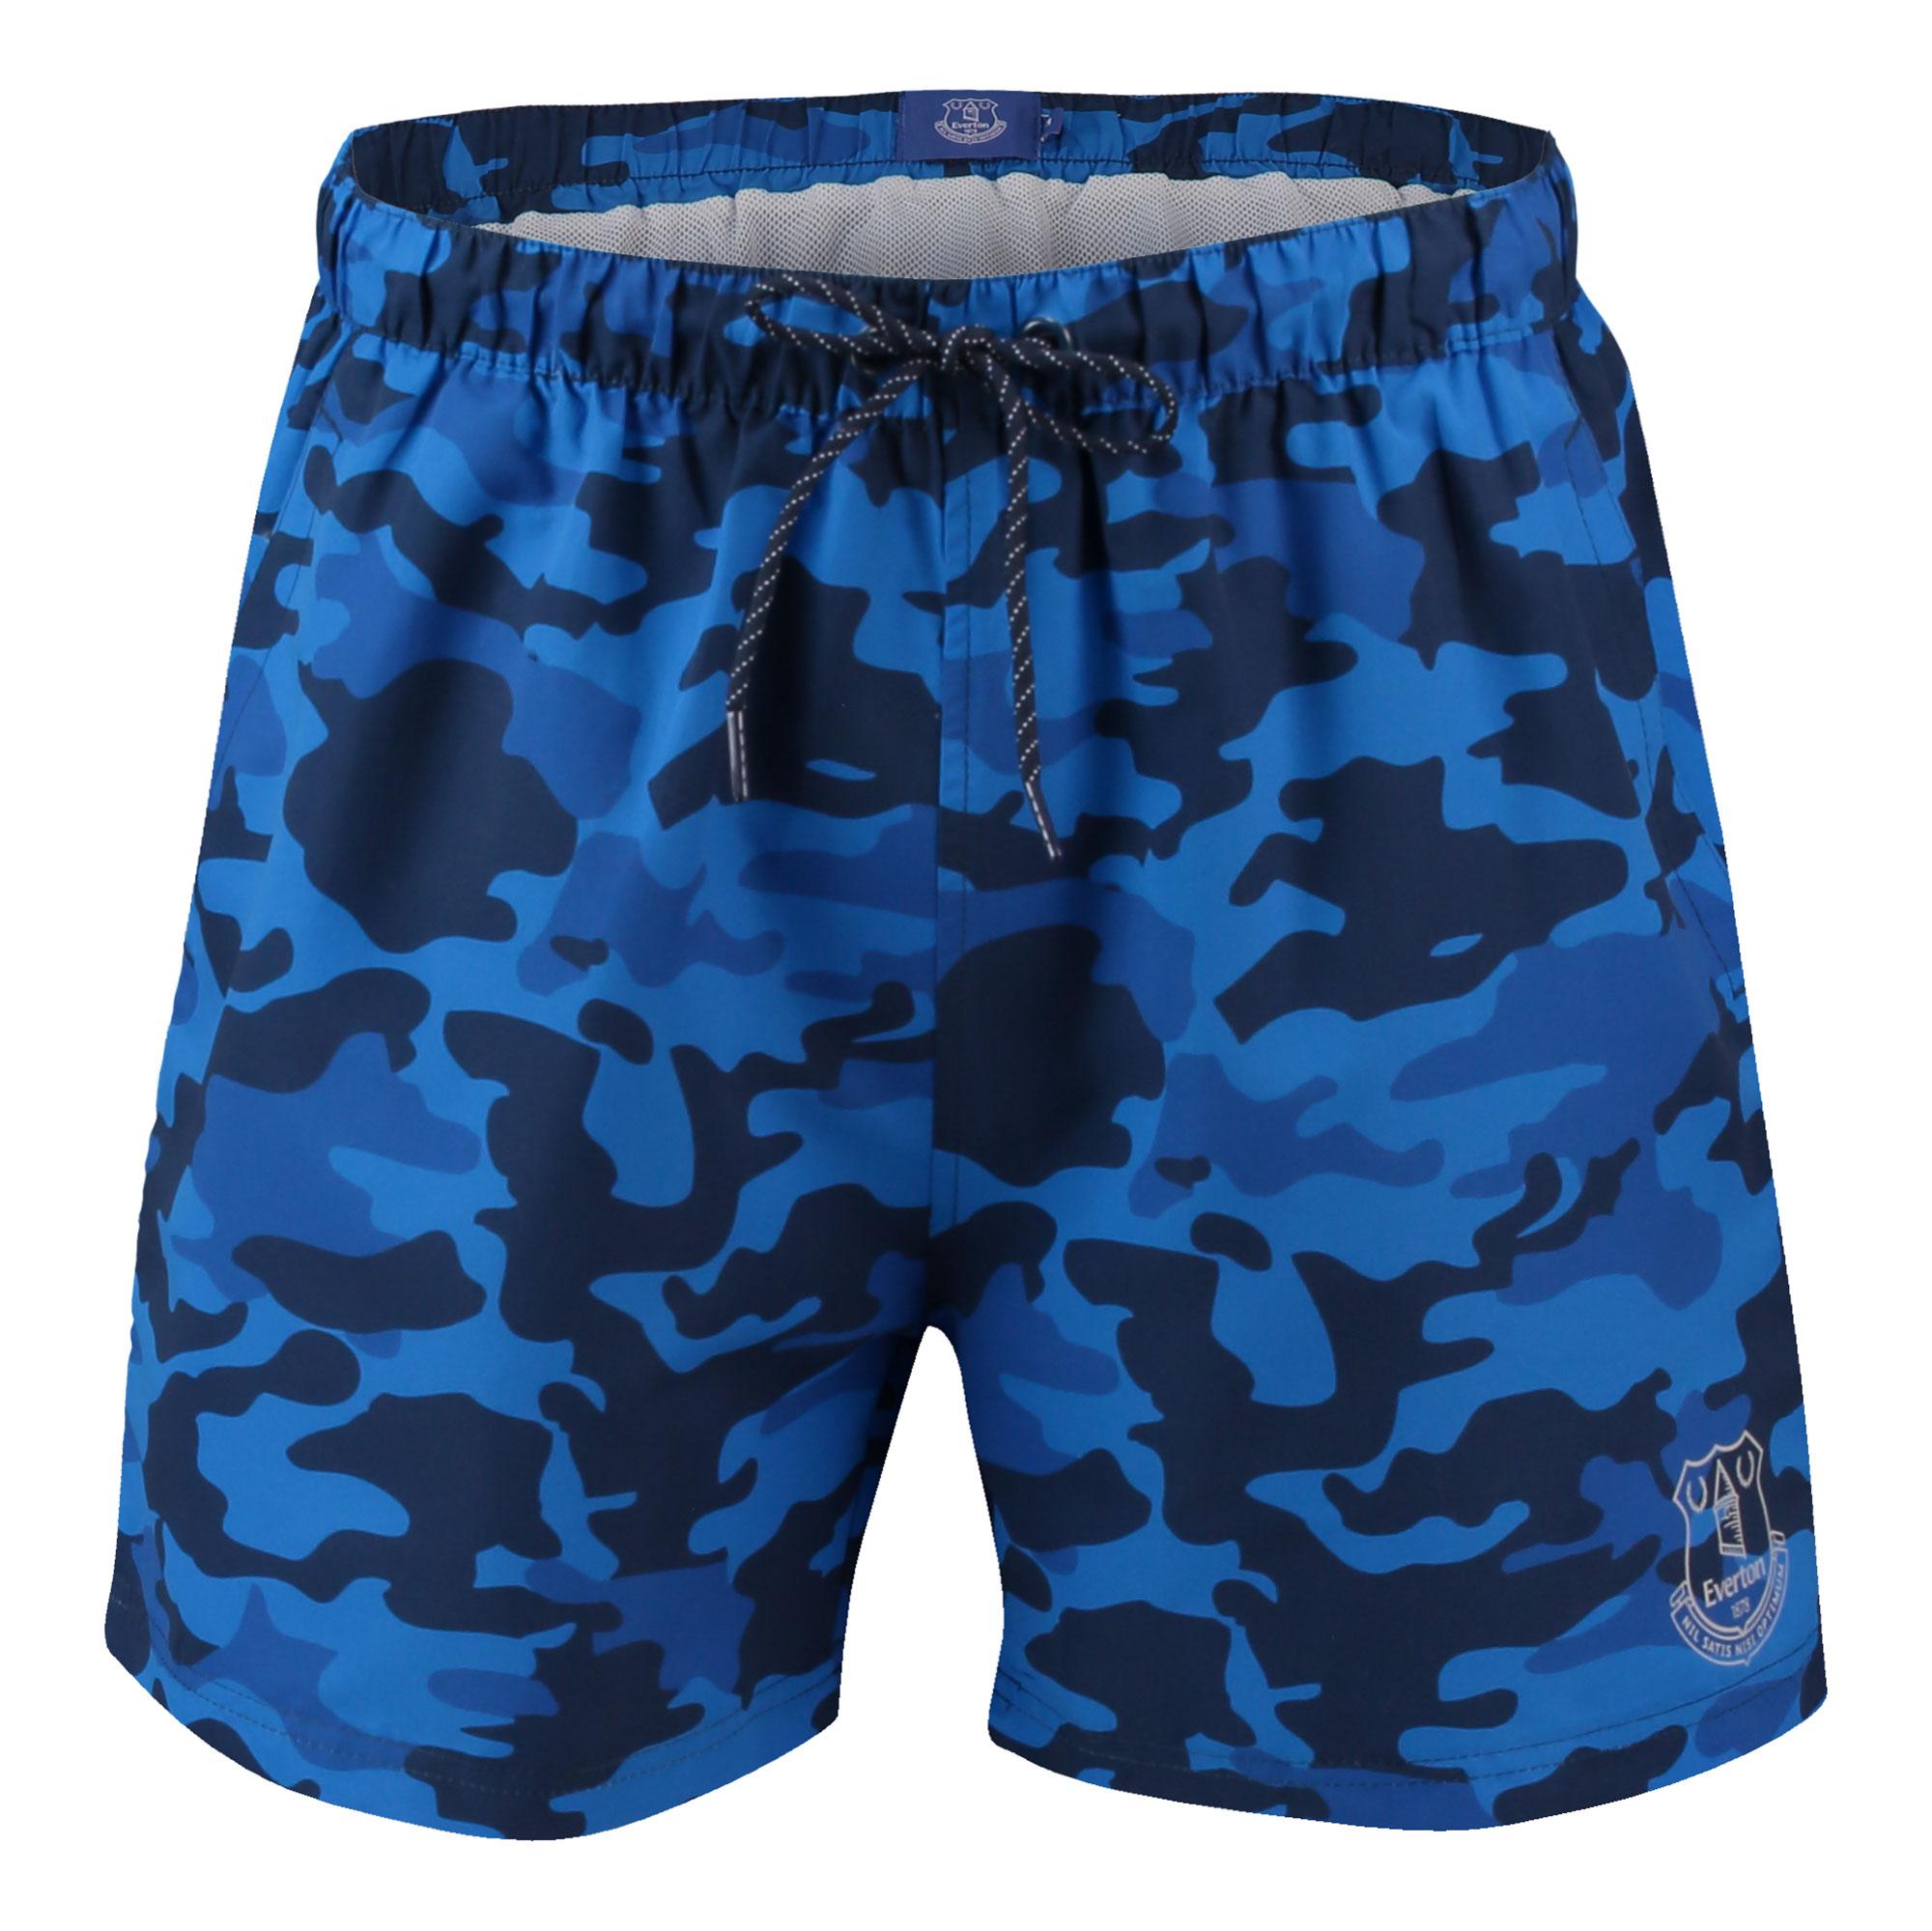 Image of Everton Camo Crest Shorts - Blue - Mens